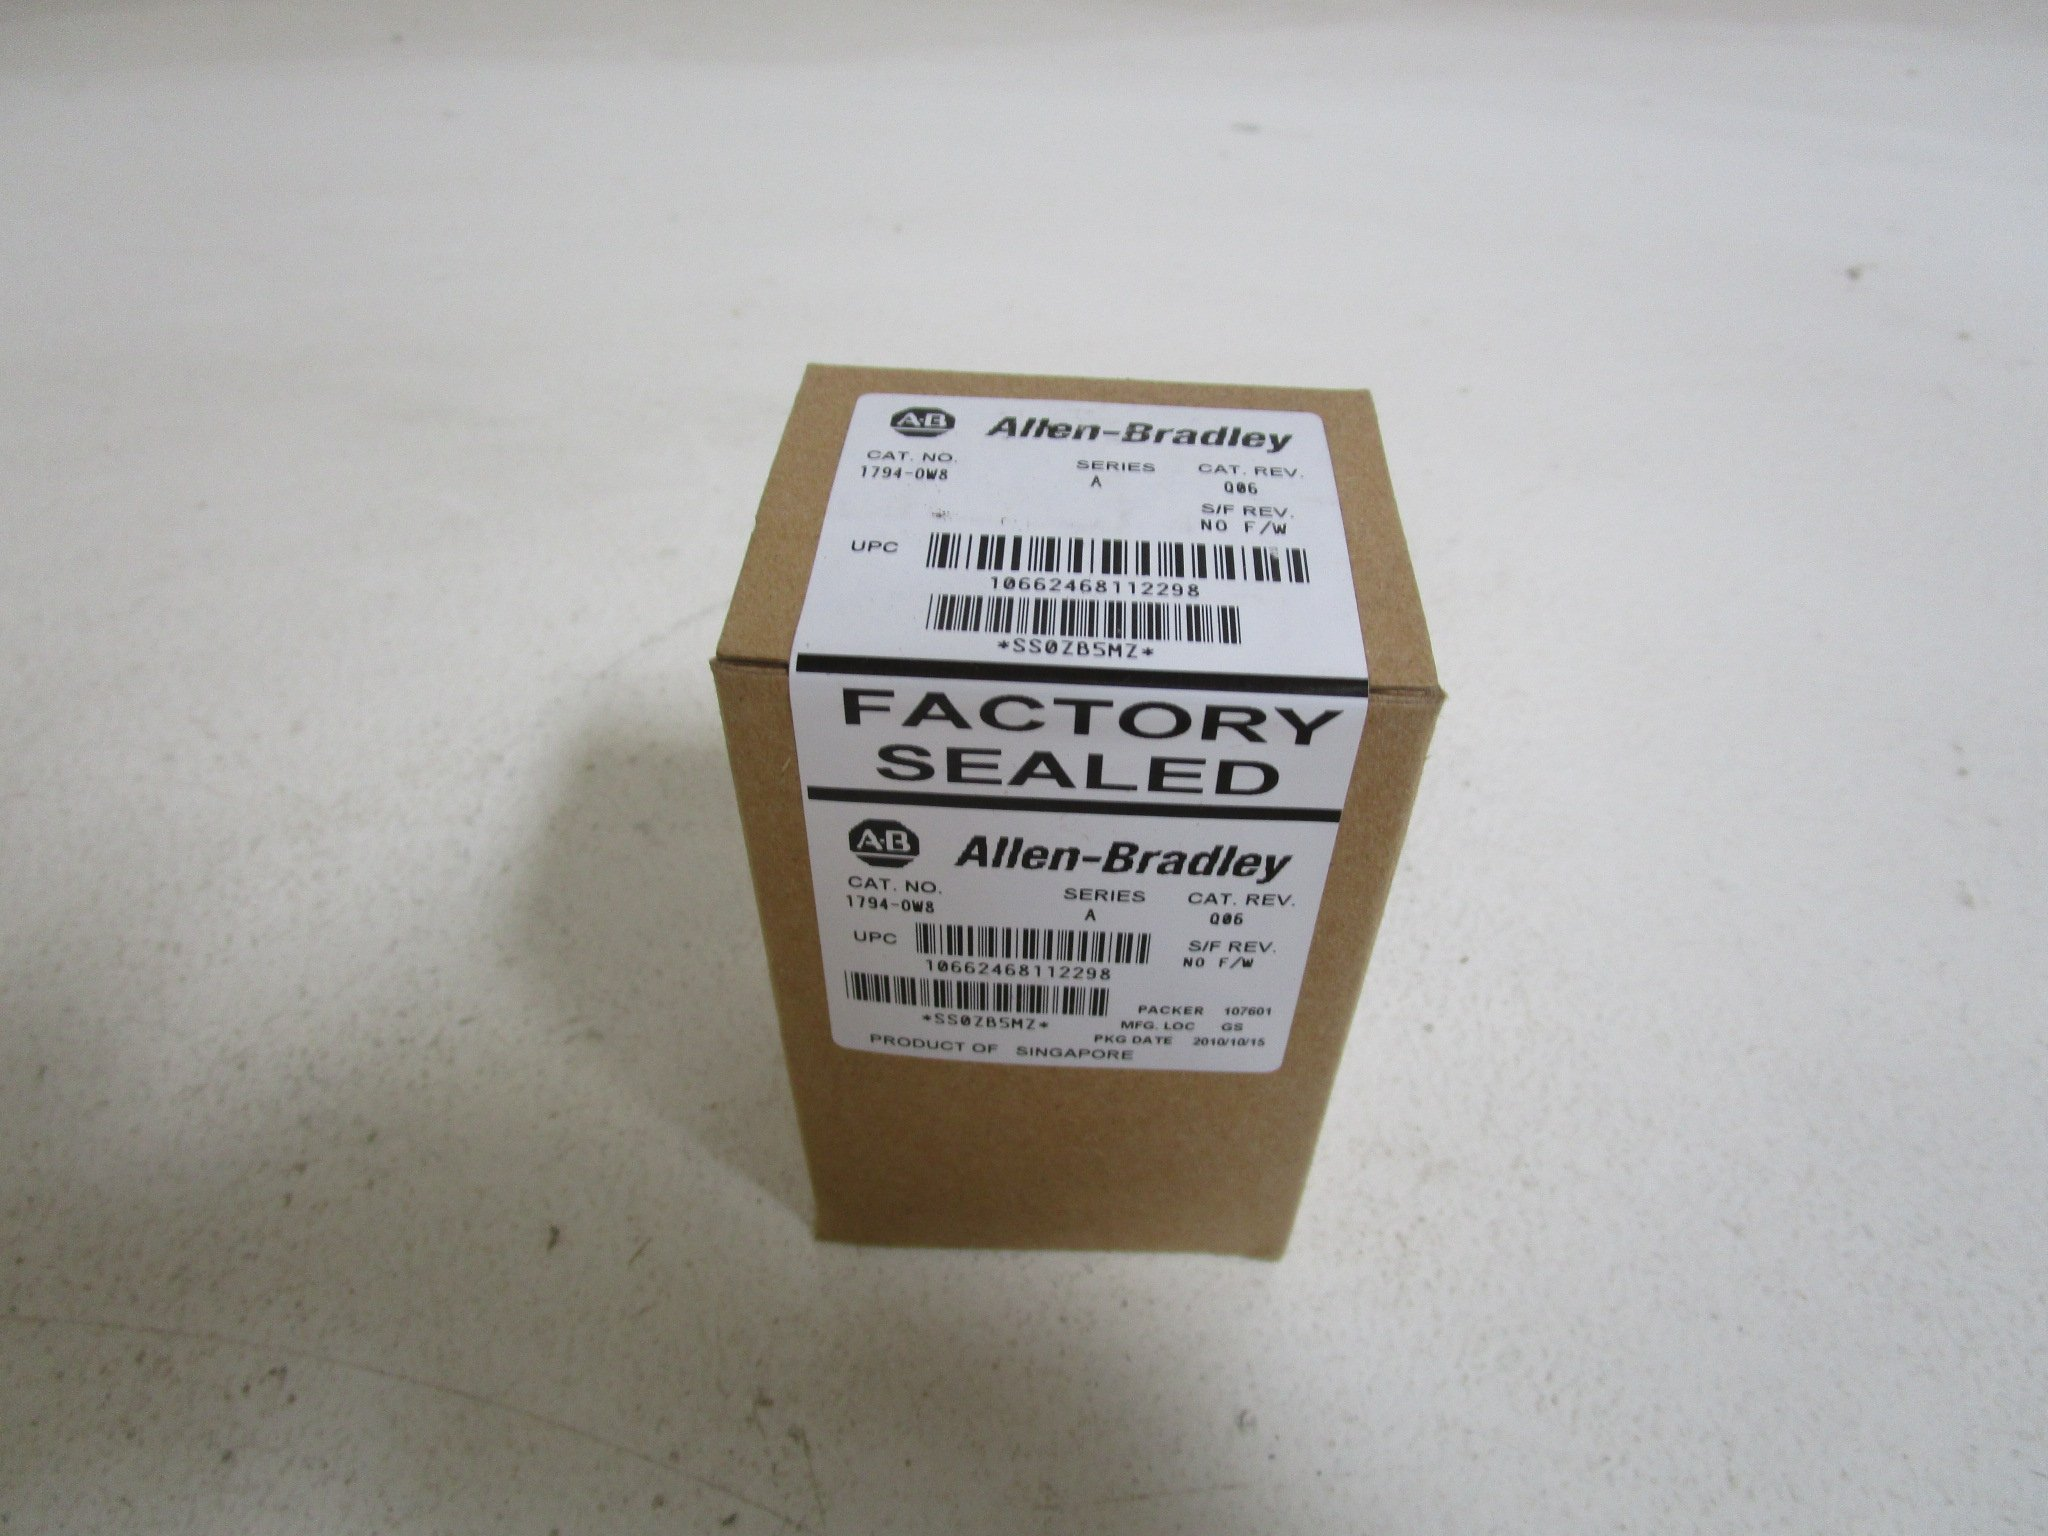 ALLEN BRADLEY 1794-OW8 SER. A RELAY OUTPUT MODULE DATE: 10/2010FACTORY SEALED